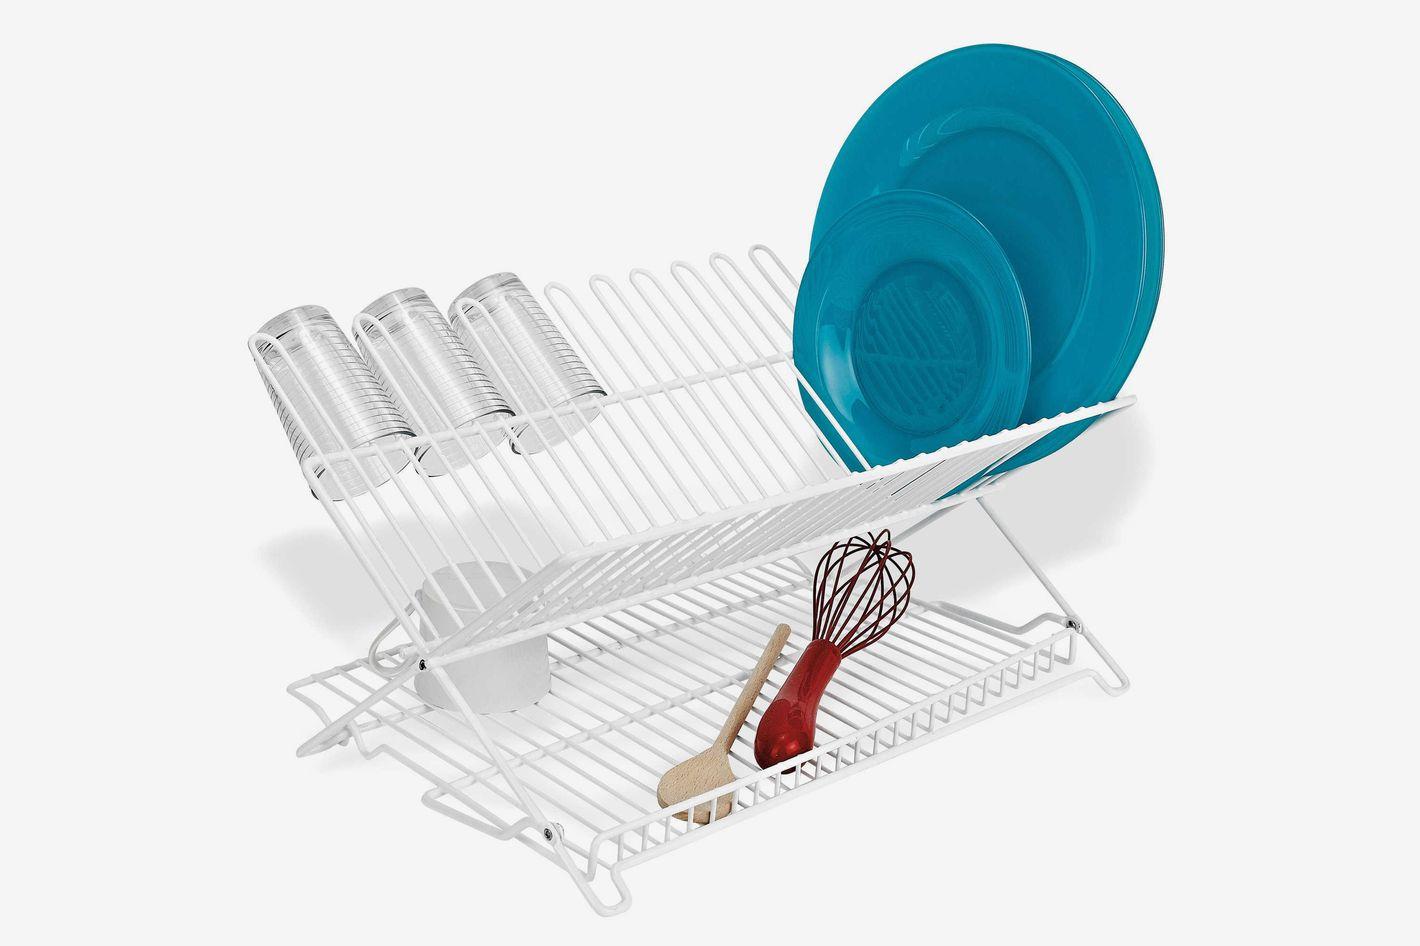 Best Dish Racks Drying Racks Drainers On Amazon